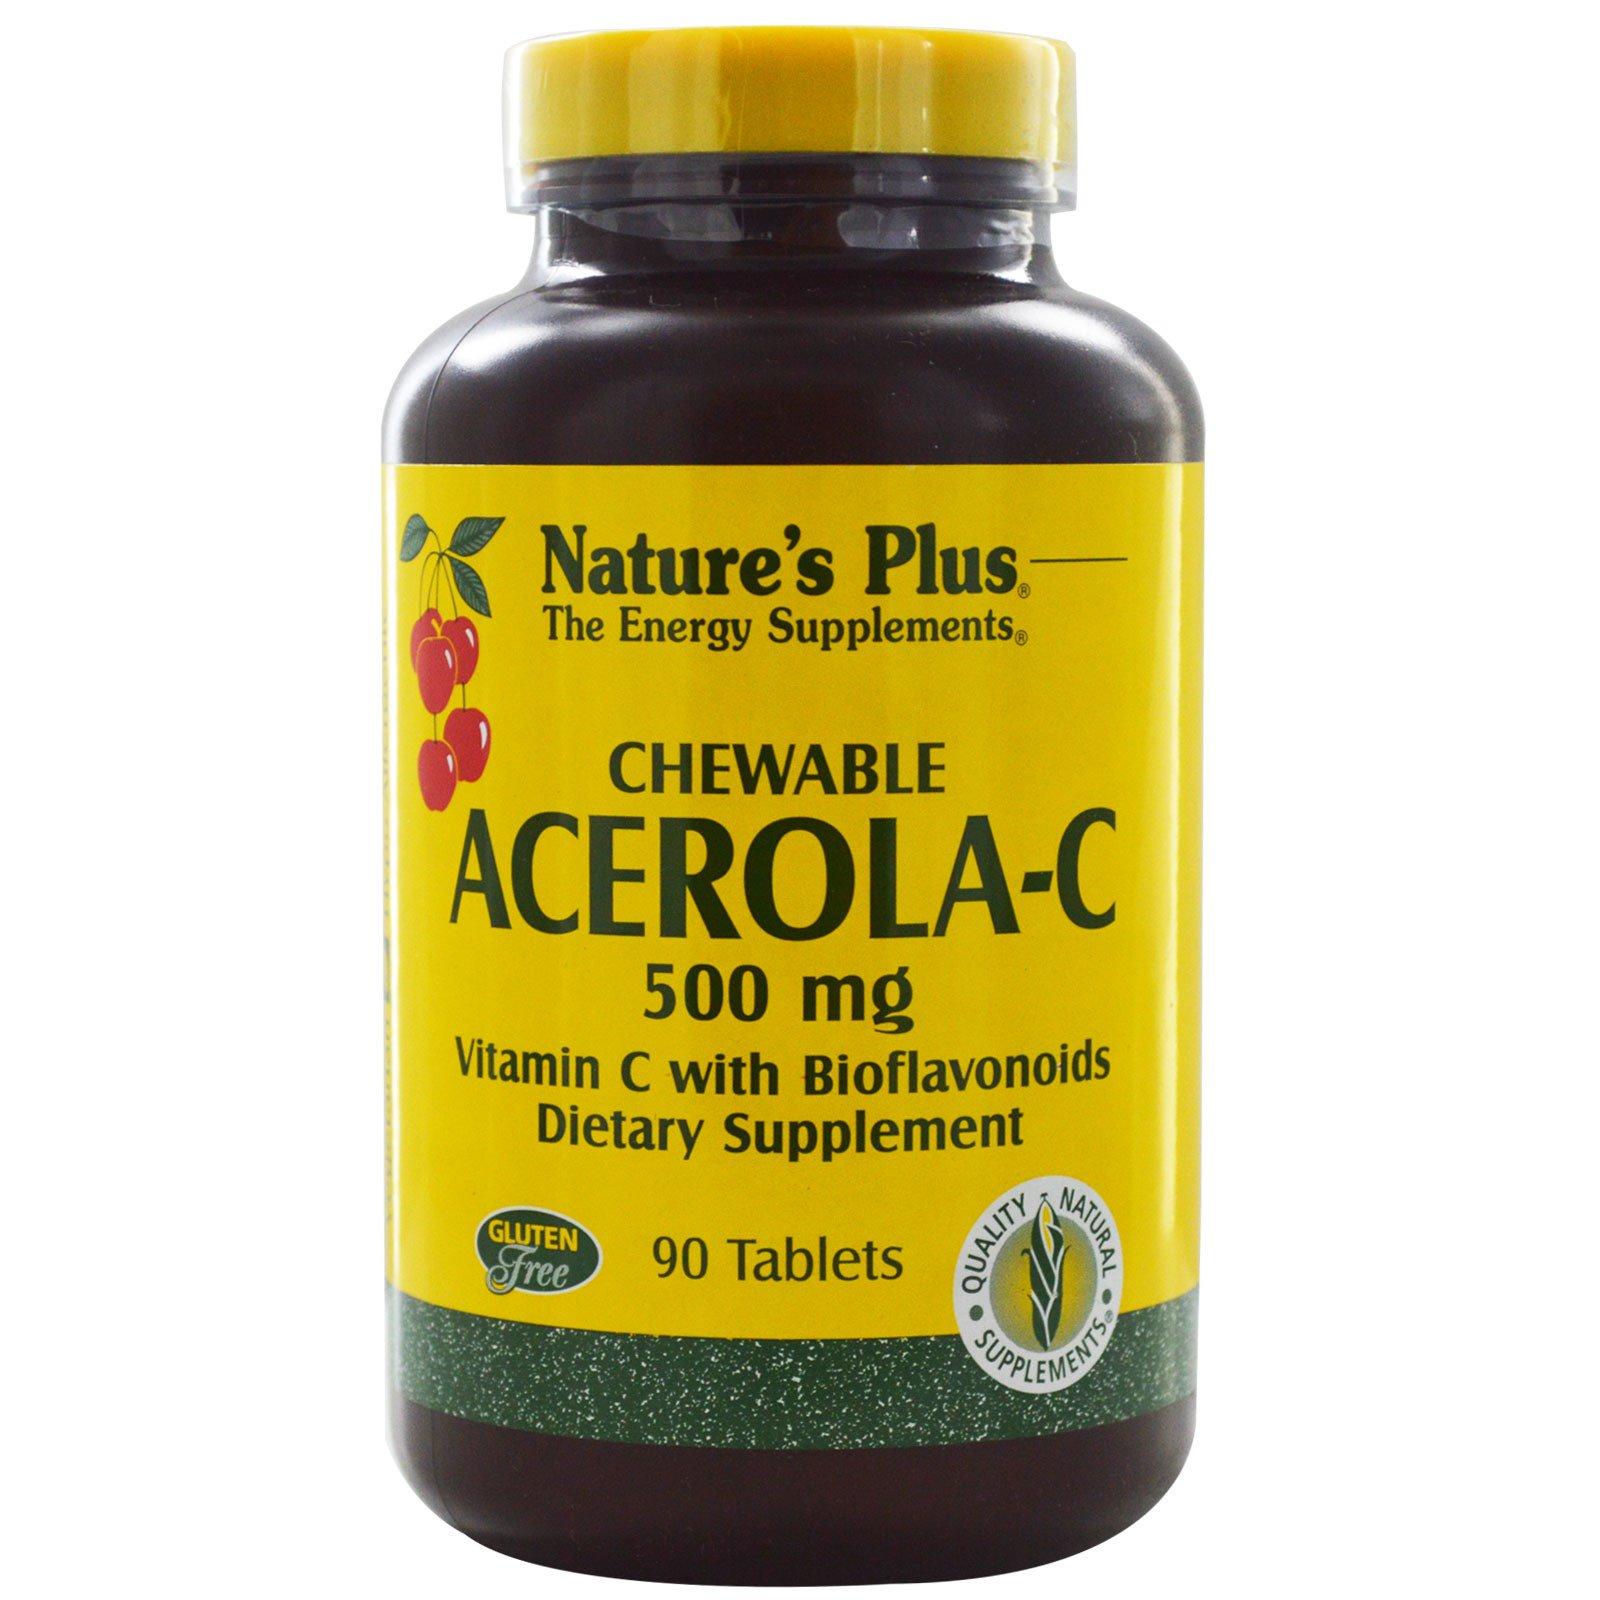 Nature's Plus, Жевательная барбадосская вишня-С, витамин С с биофлавоноидами, 90 таблеток